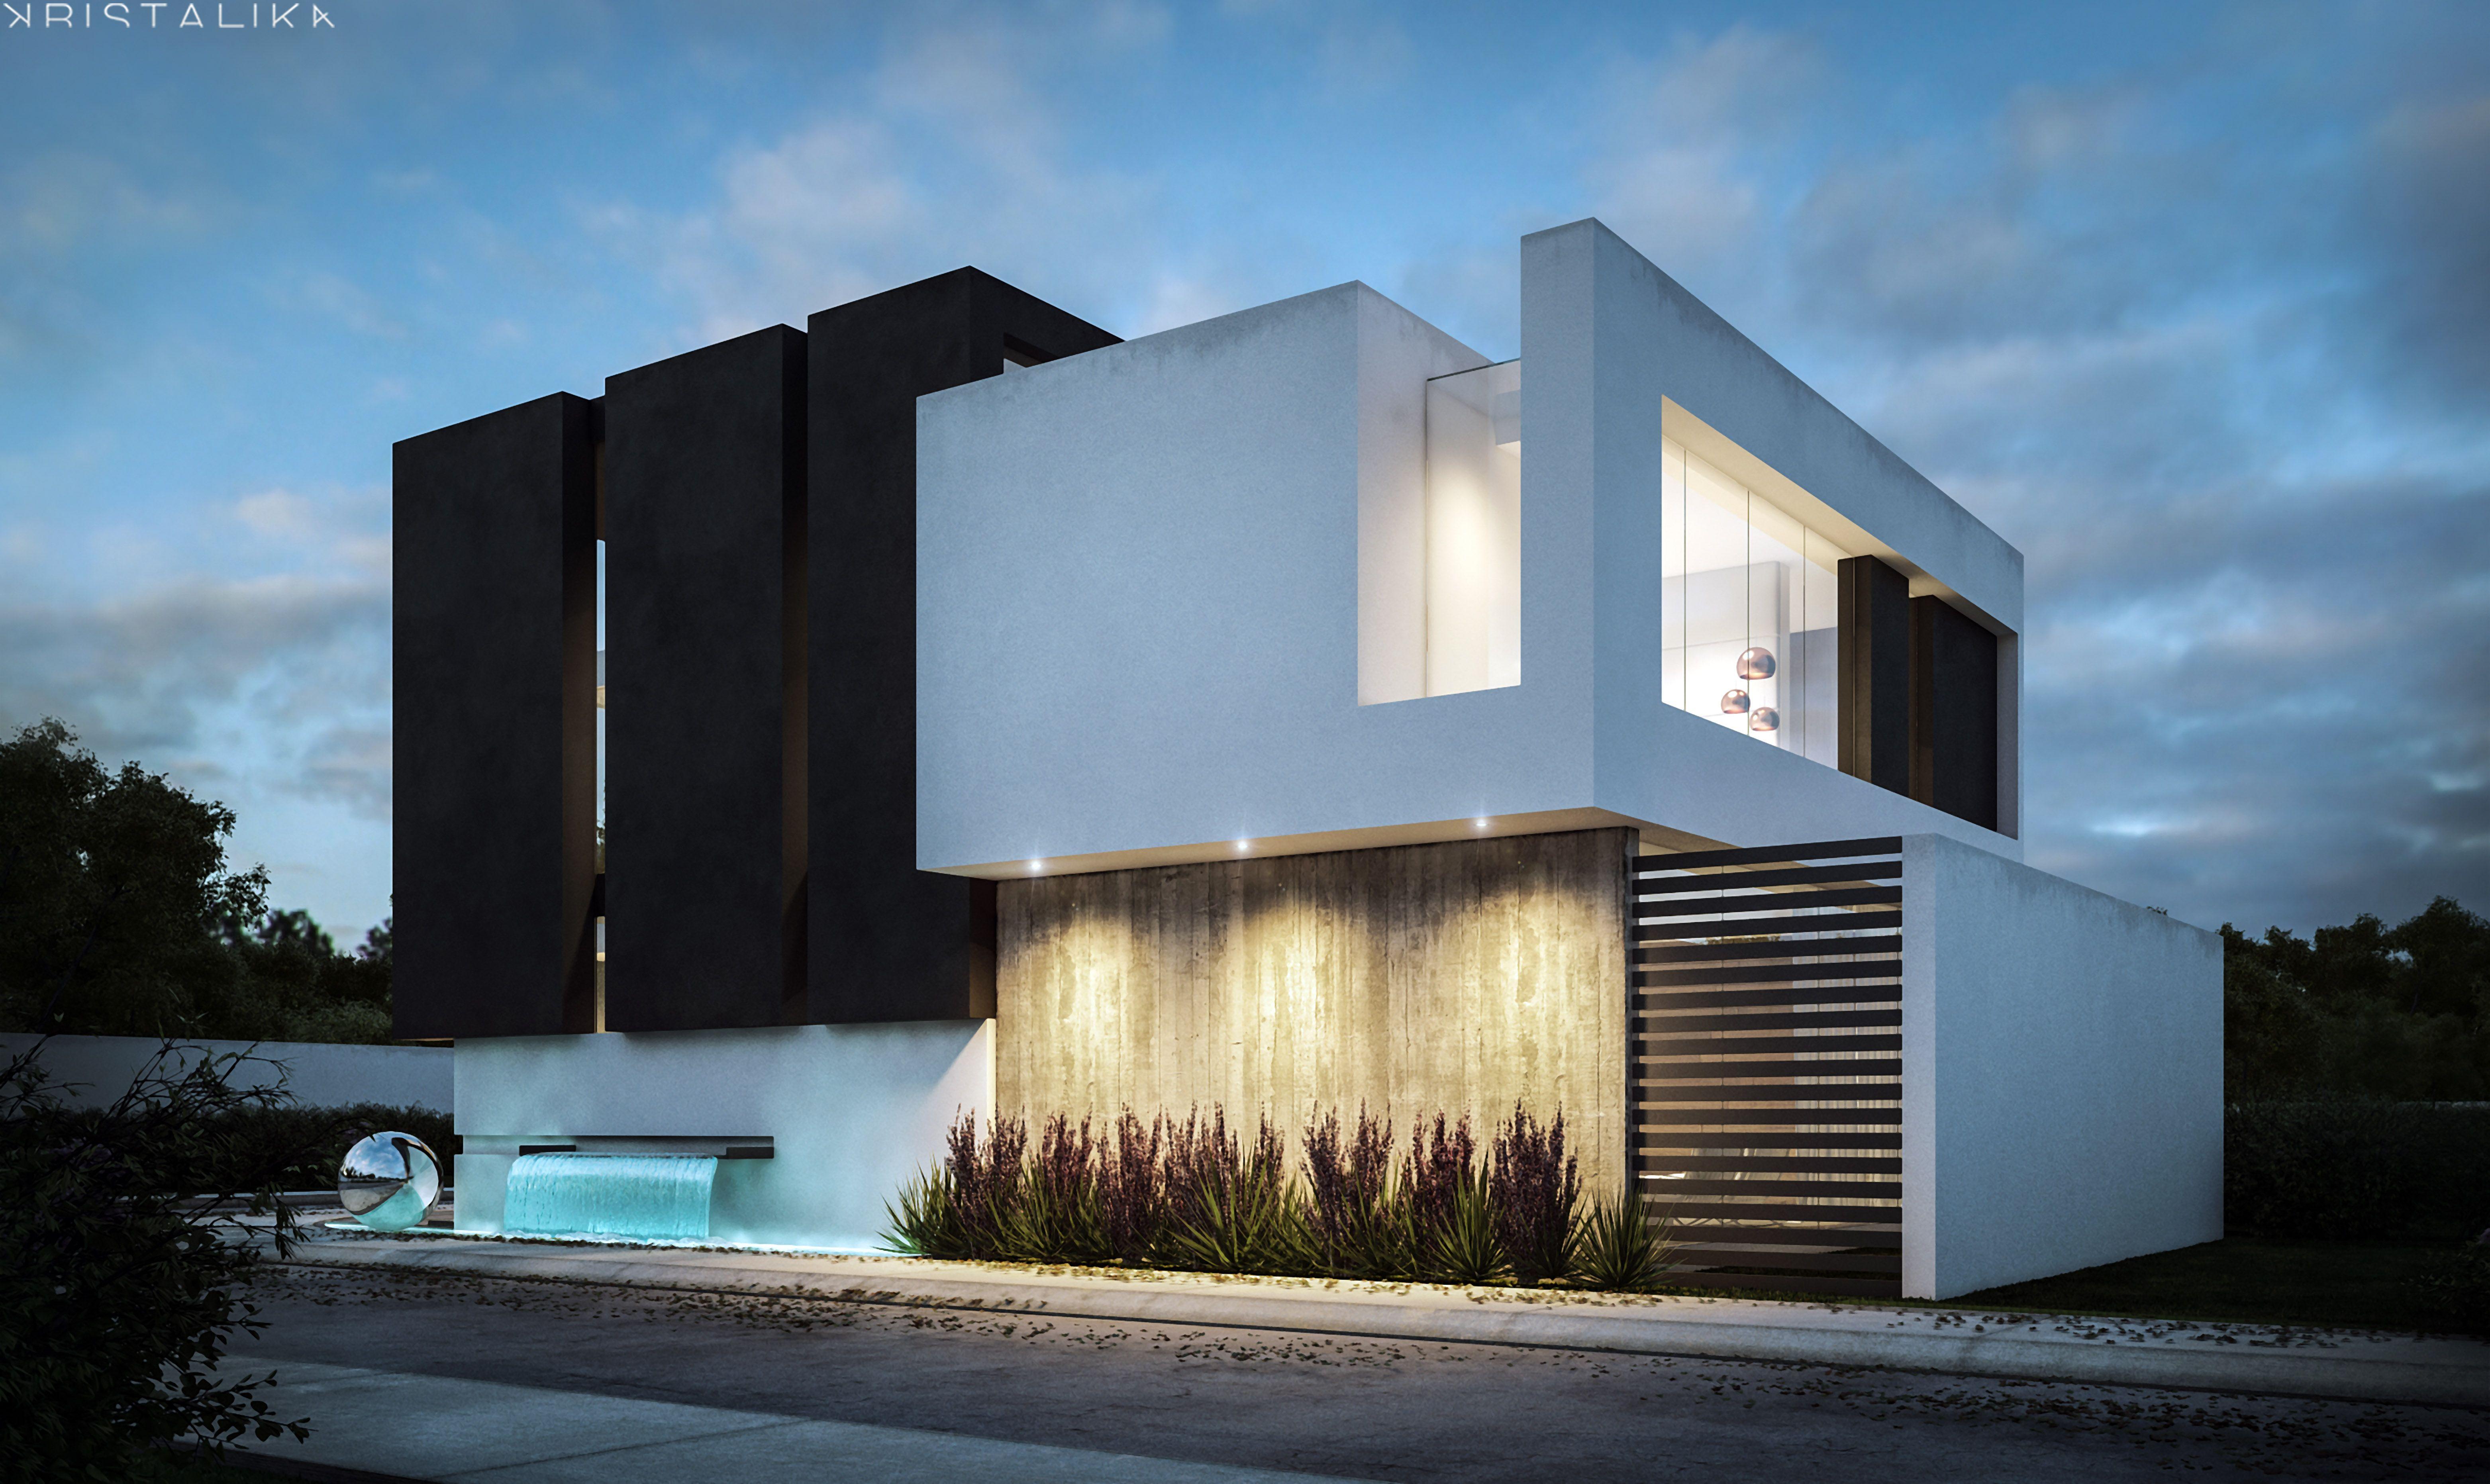 Imagen relacionada arquitectura casas modernas - Casas arquitectura moderna ...